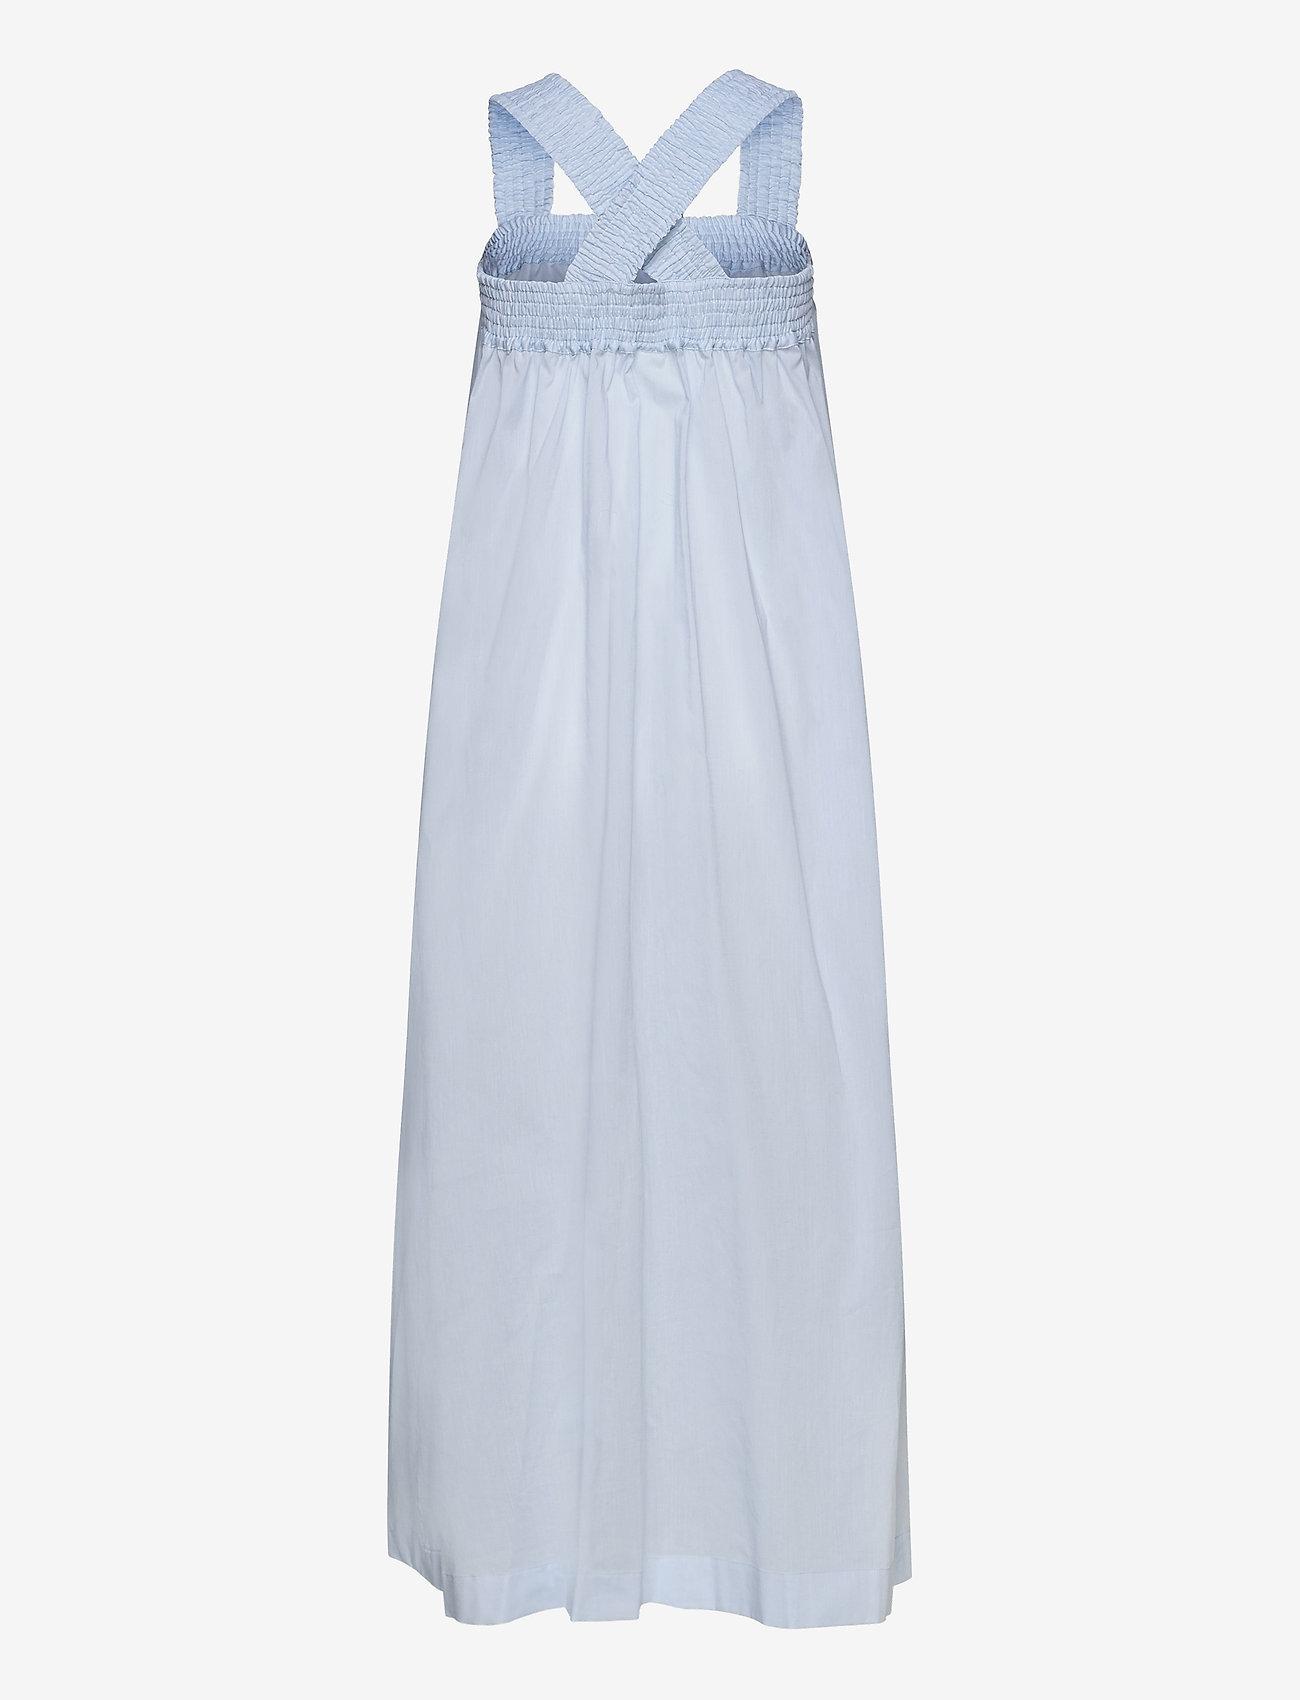 Max Mara Leisure - CAPPA - robes maxi - light blue